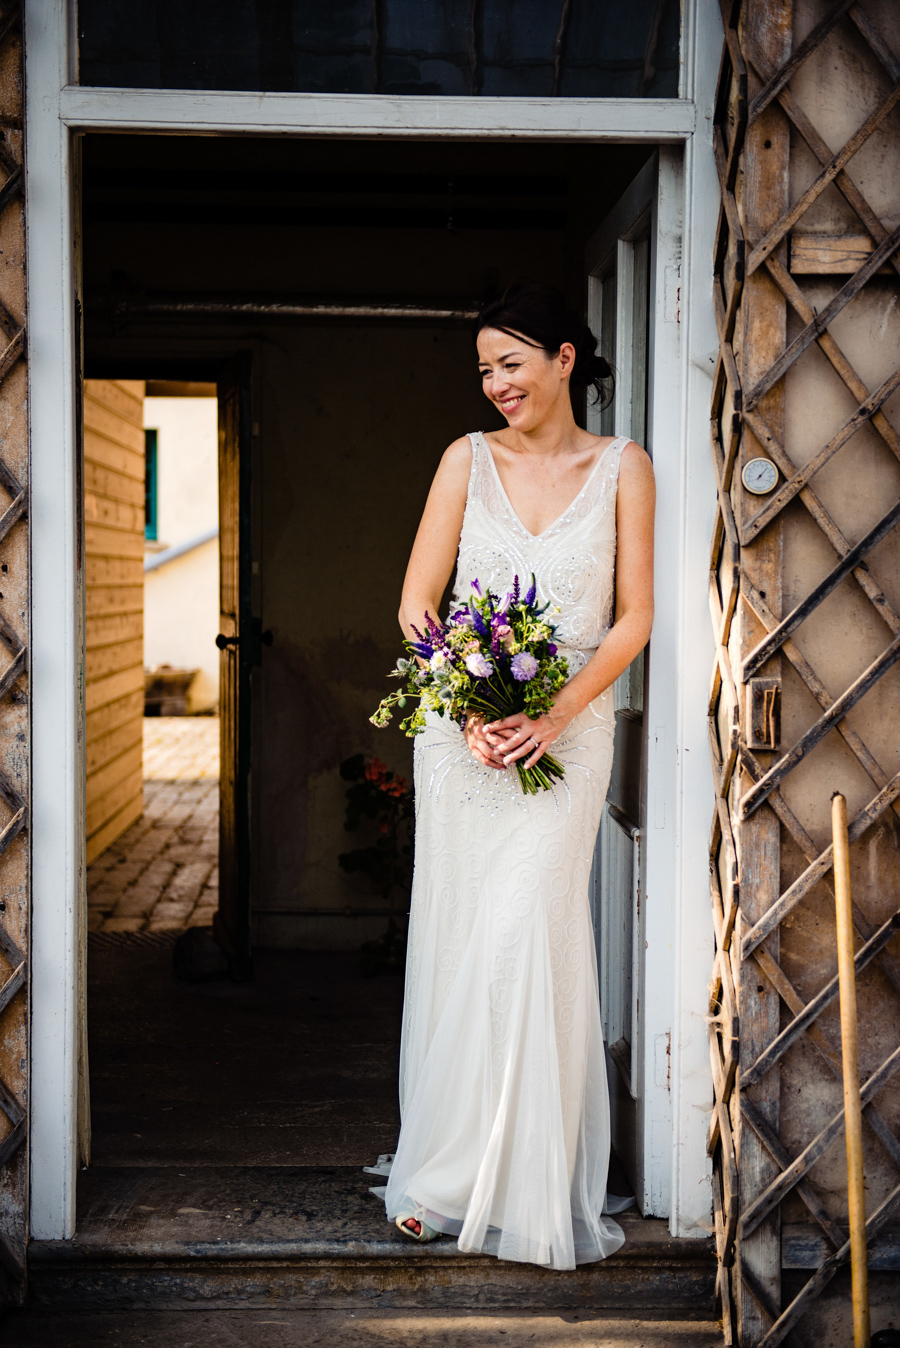 Nikki & Gareth's gloriously happy Pennard House wedding with Jonny Barratt Photography (49)